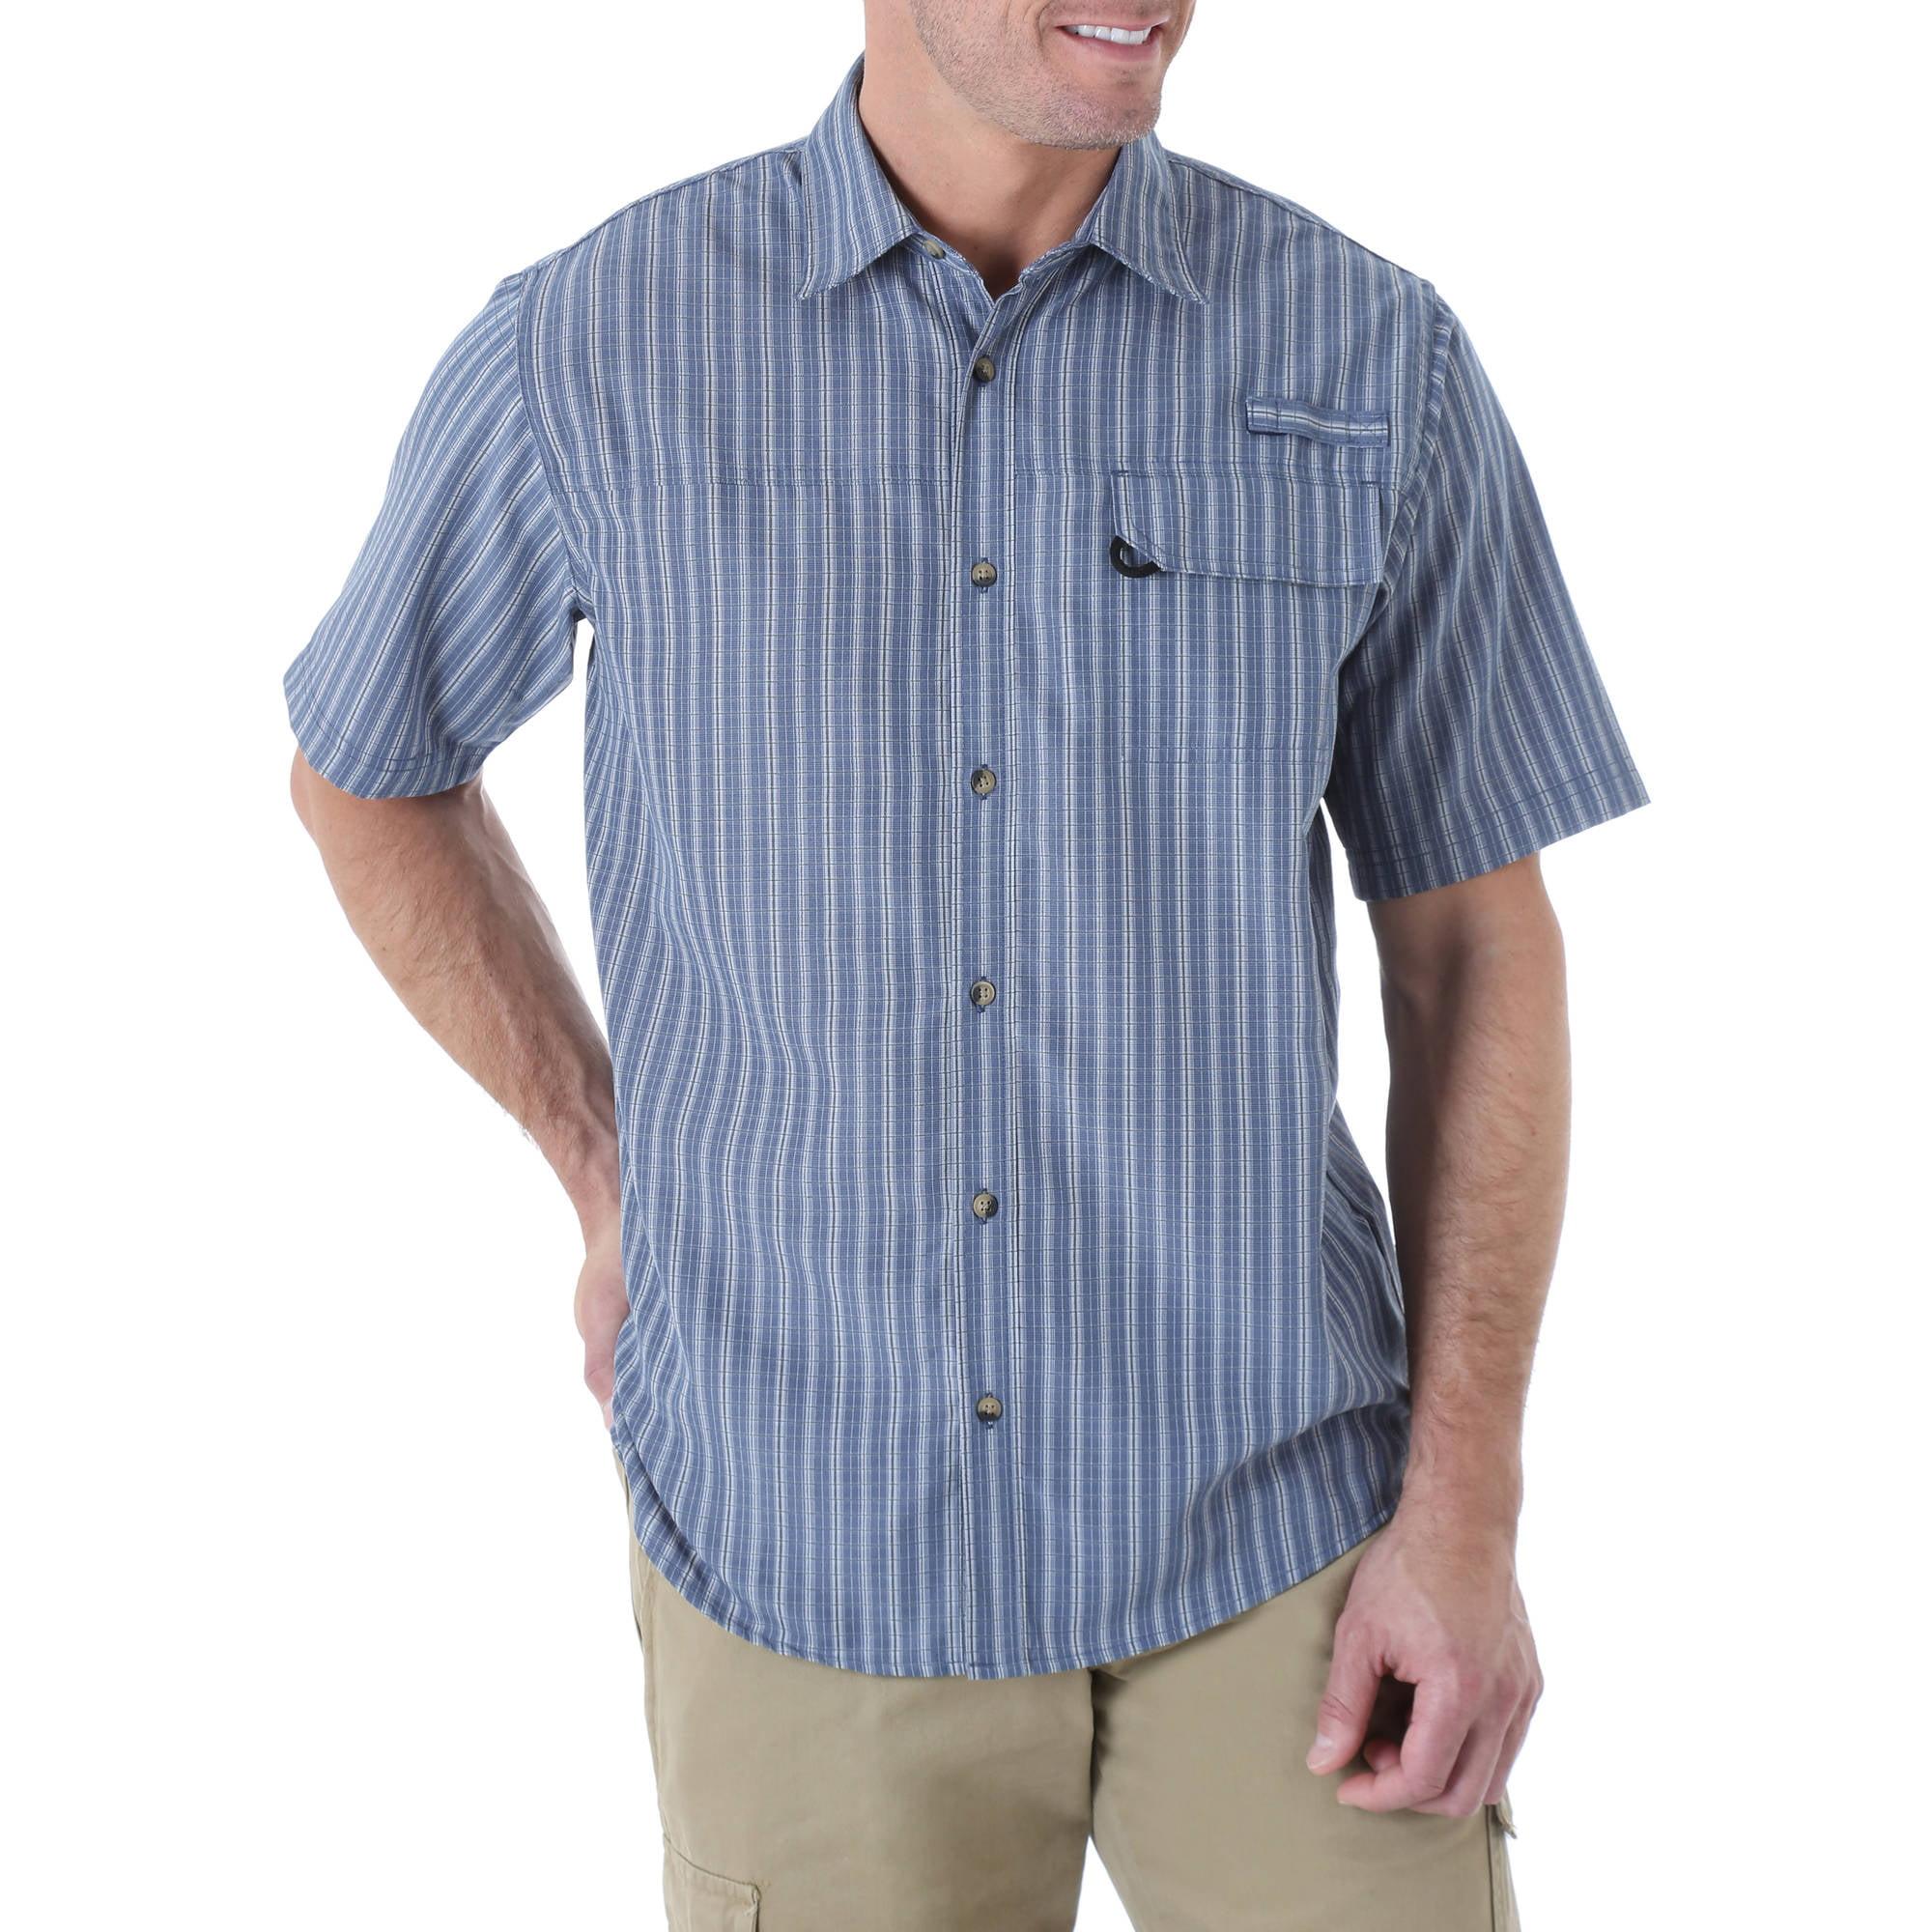 Wrangler Mens' Short Sleeve Plaid Utility Shirt